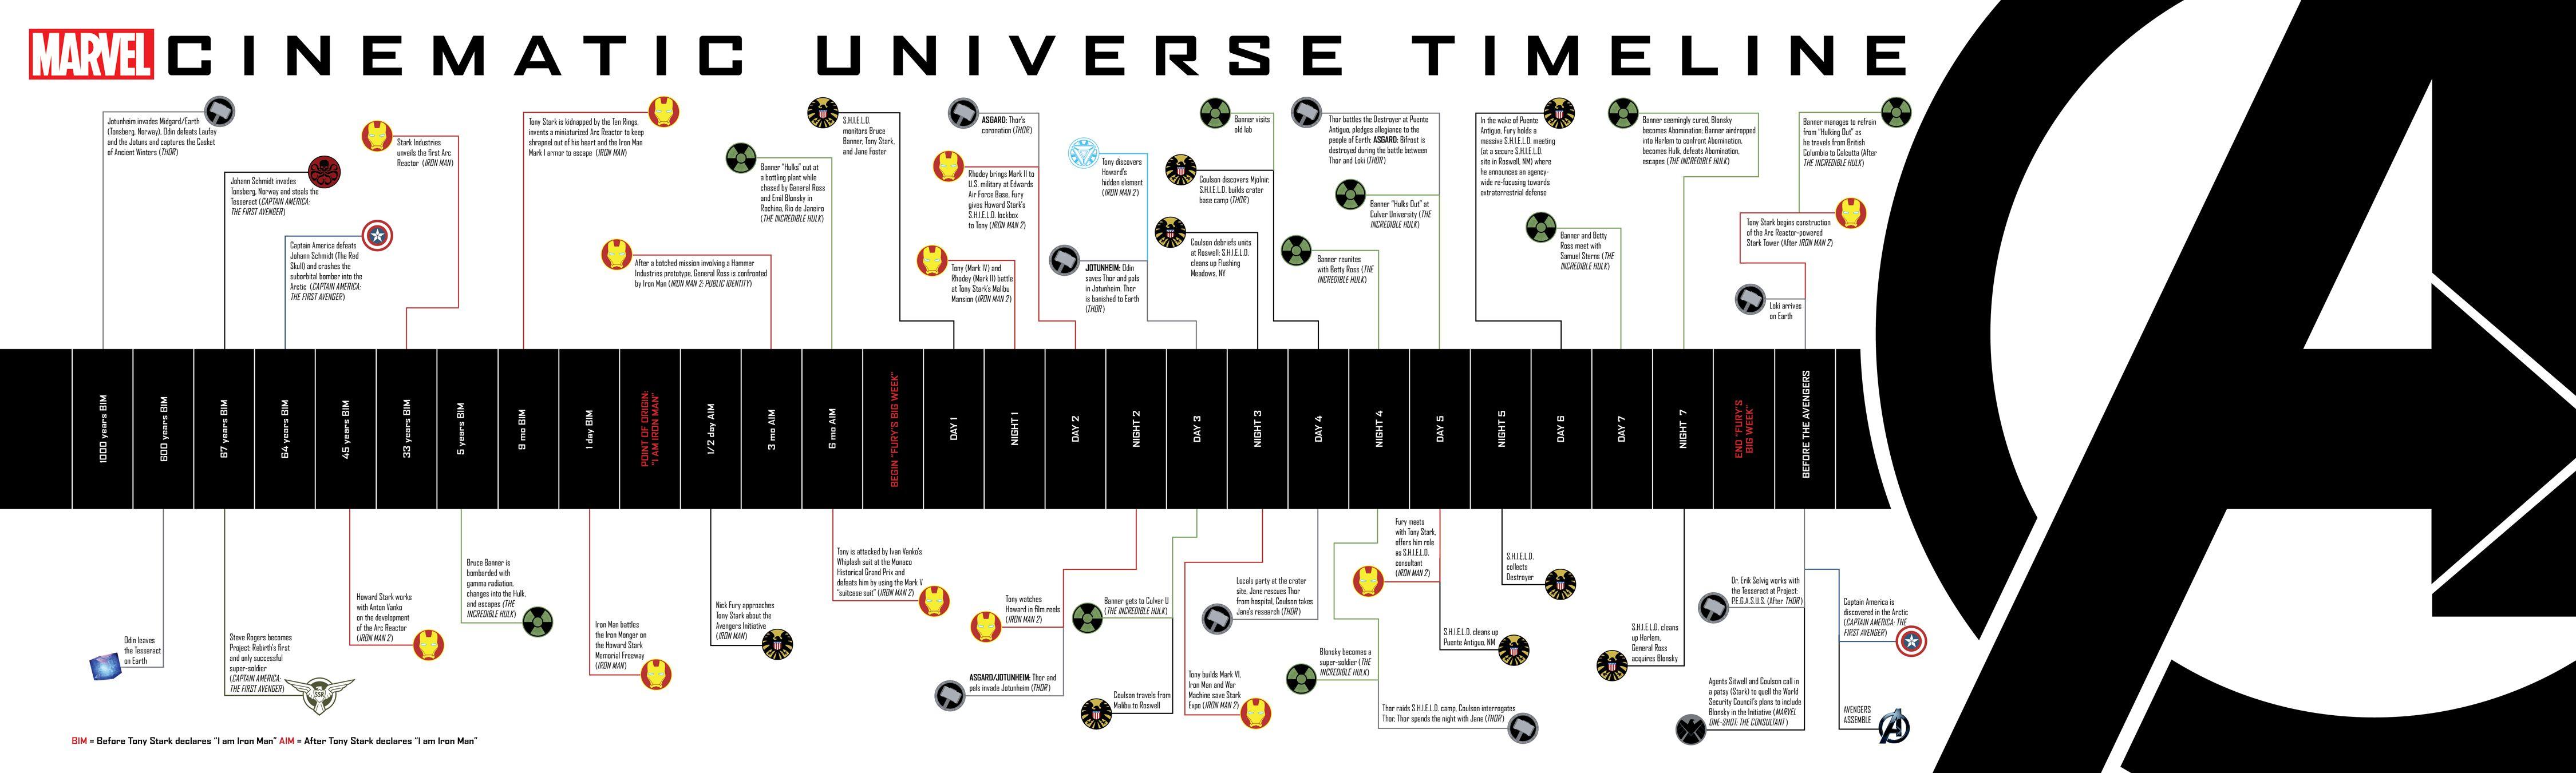 marvel film cronologia